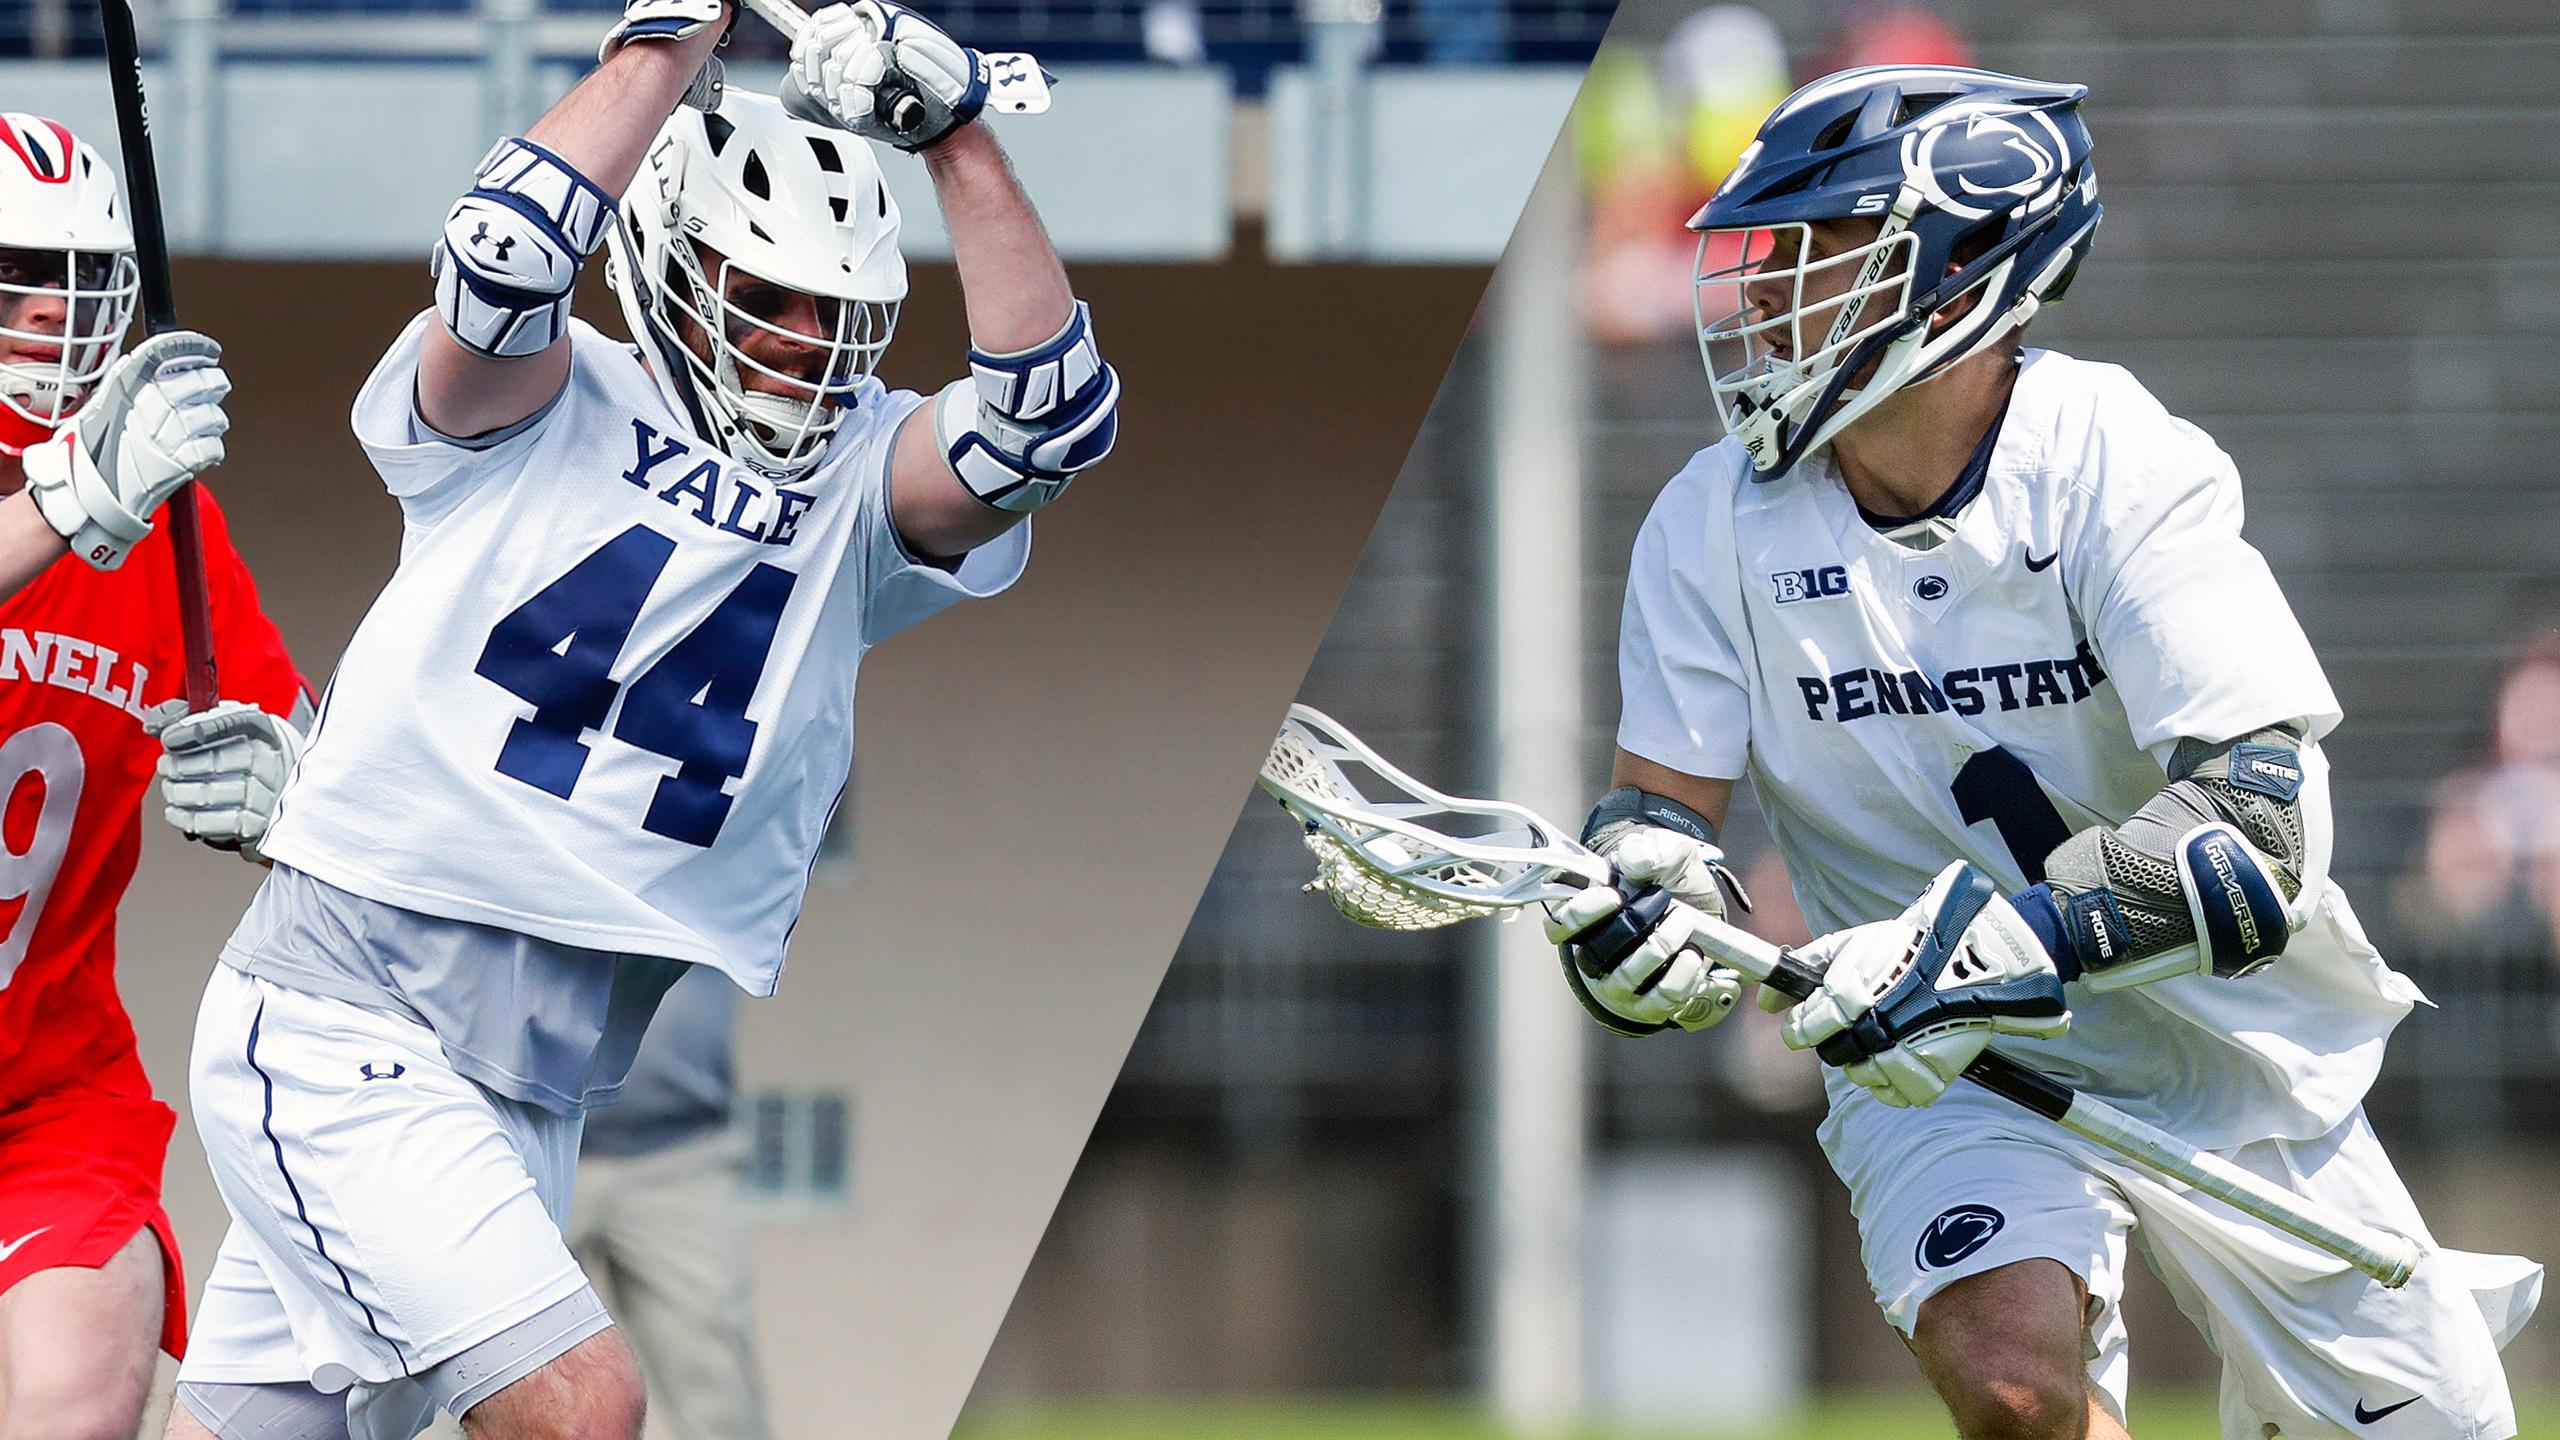 #5 Yale vs. #1 Penn State (Semifinal #2) (re-air)